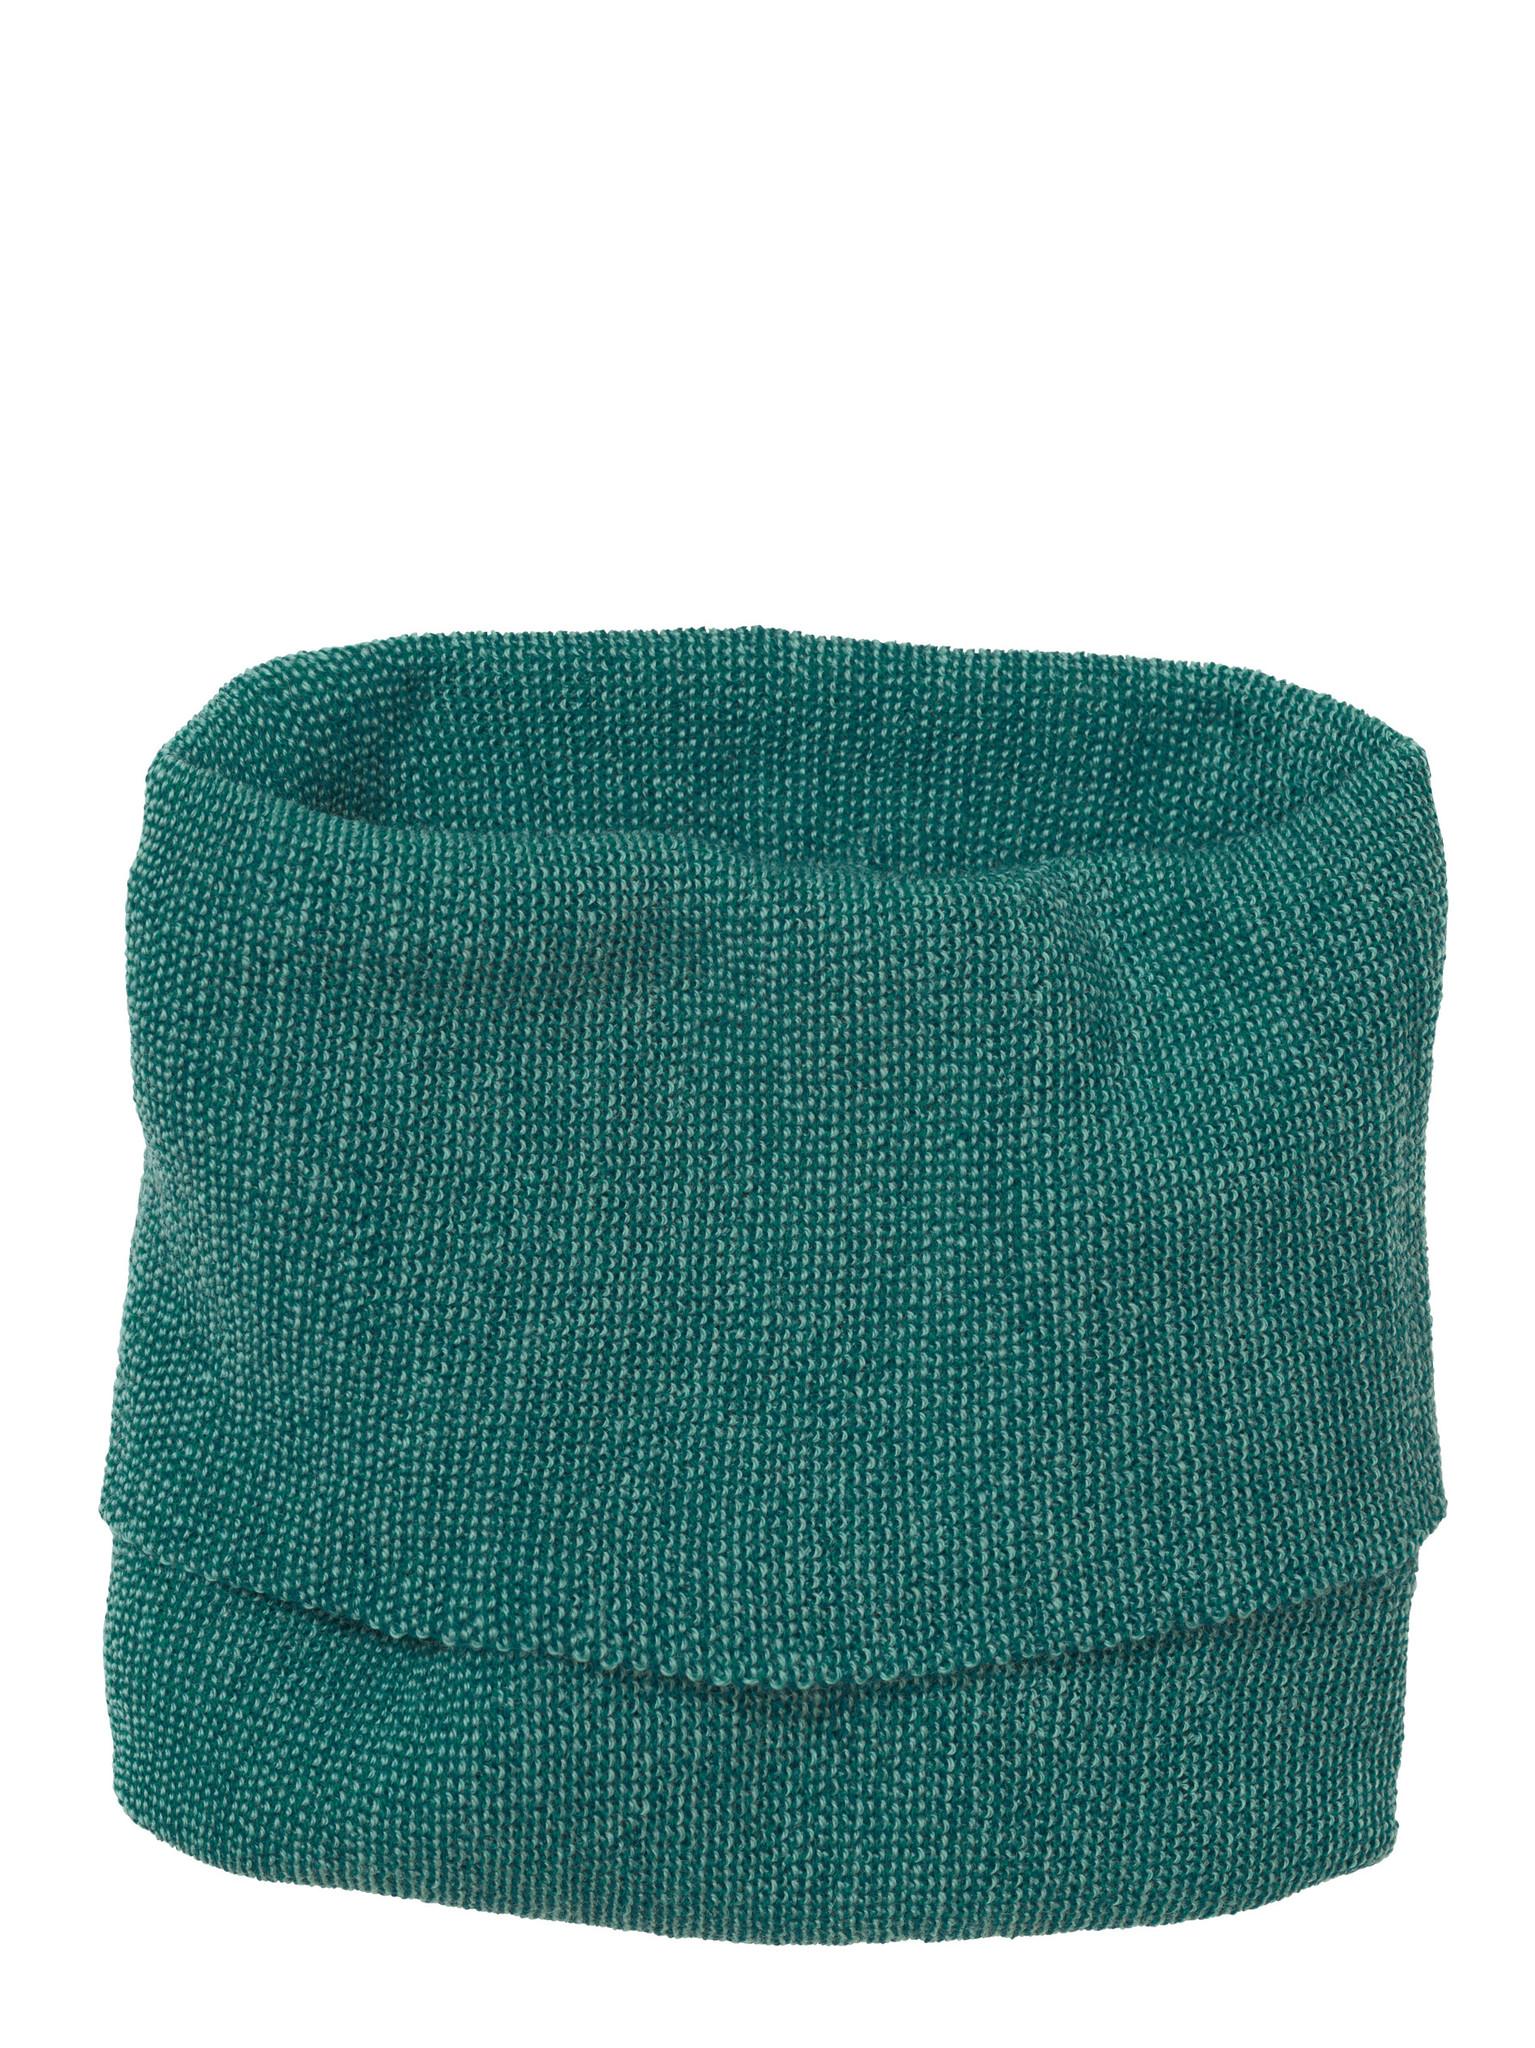 Disana Disana Tube scarf -100% wol - Pacific/Lagoon (981)